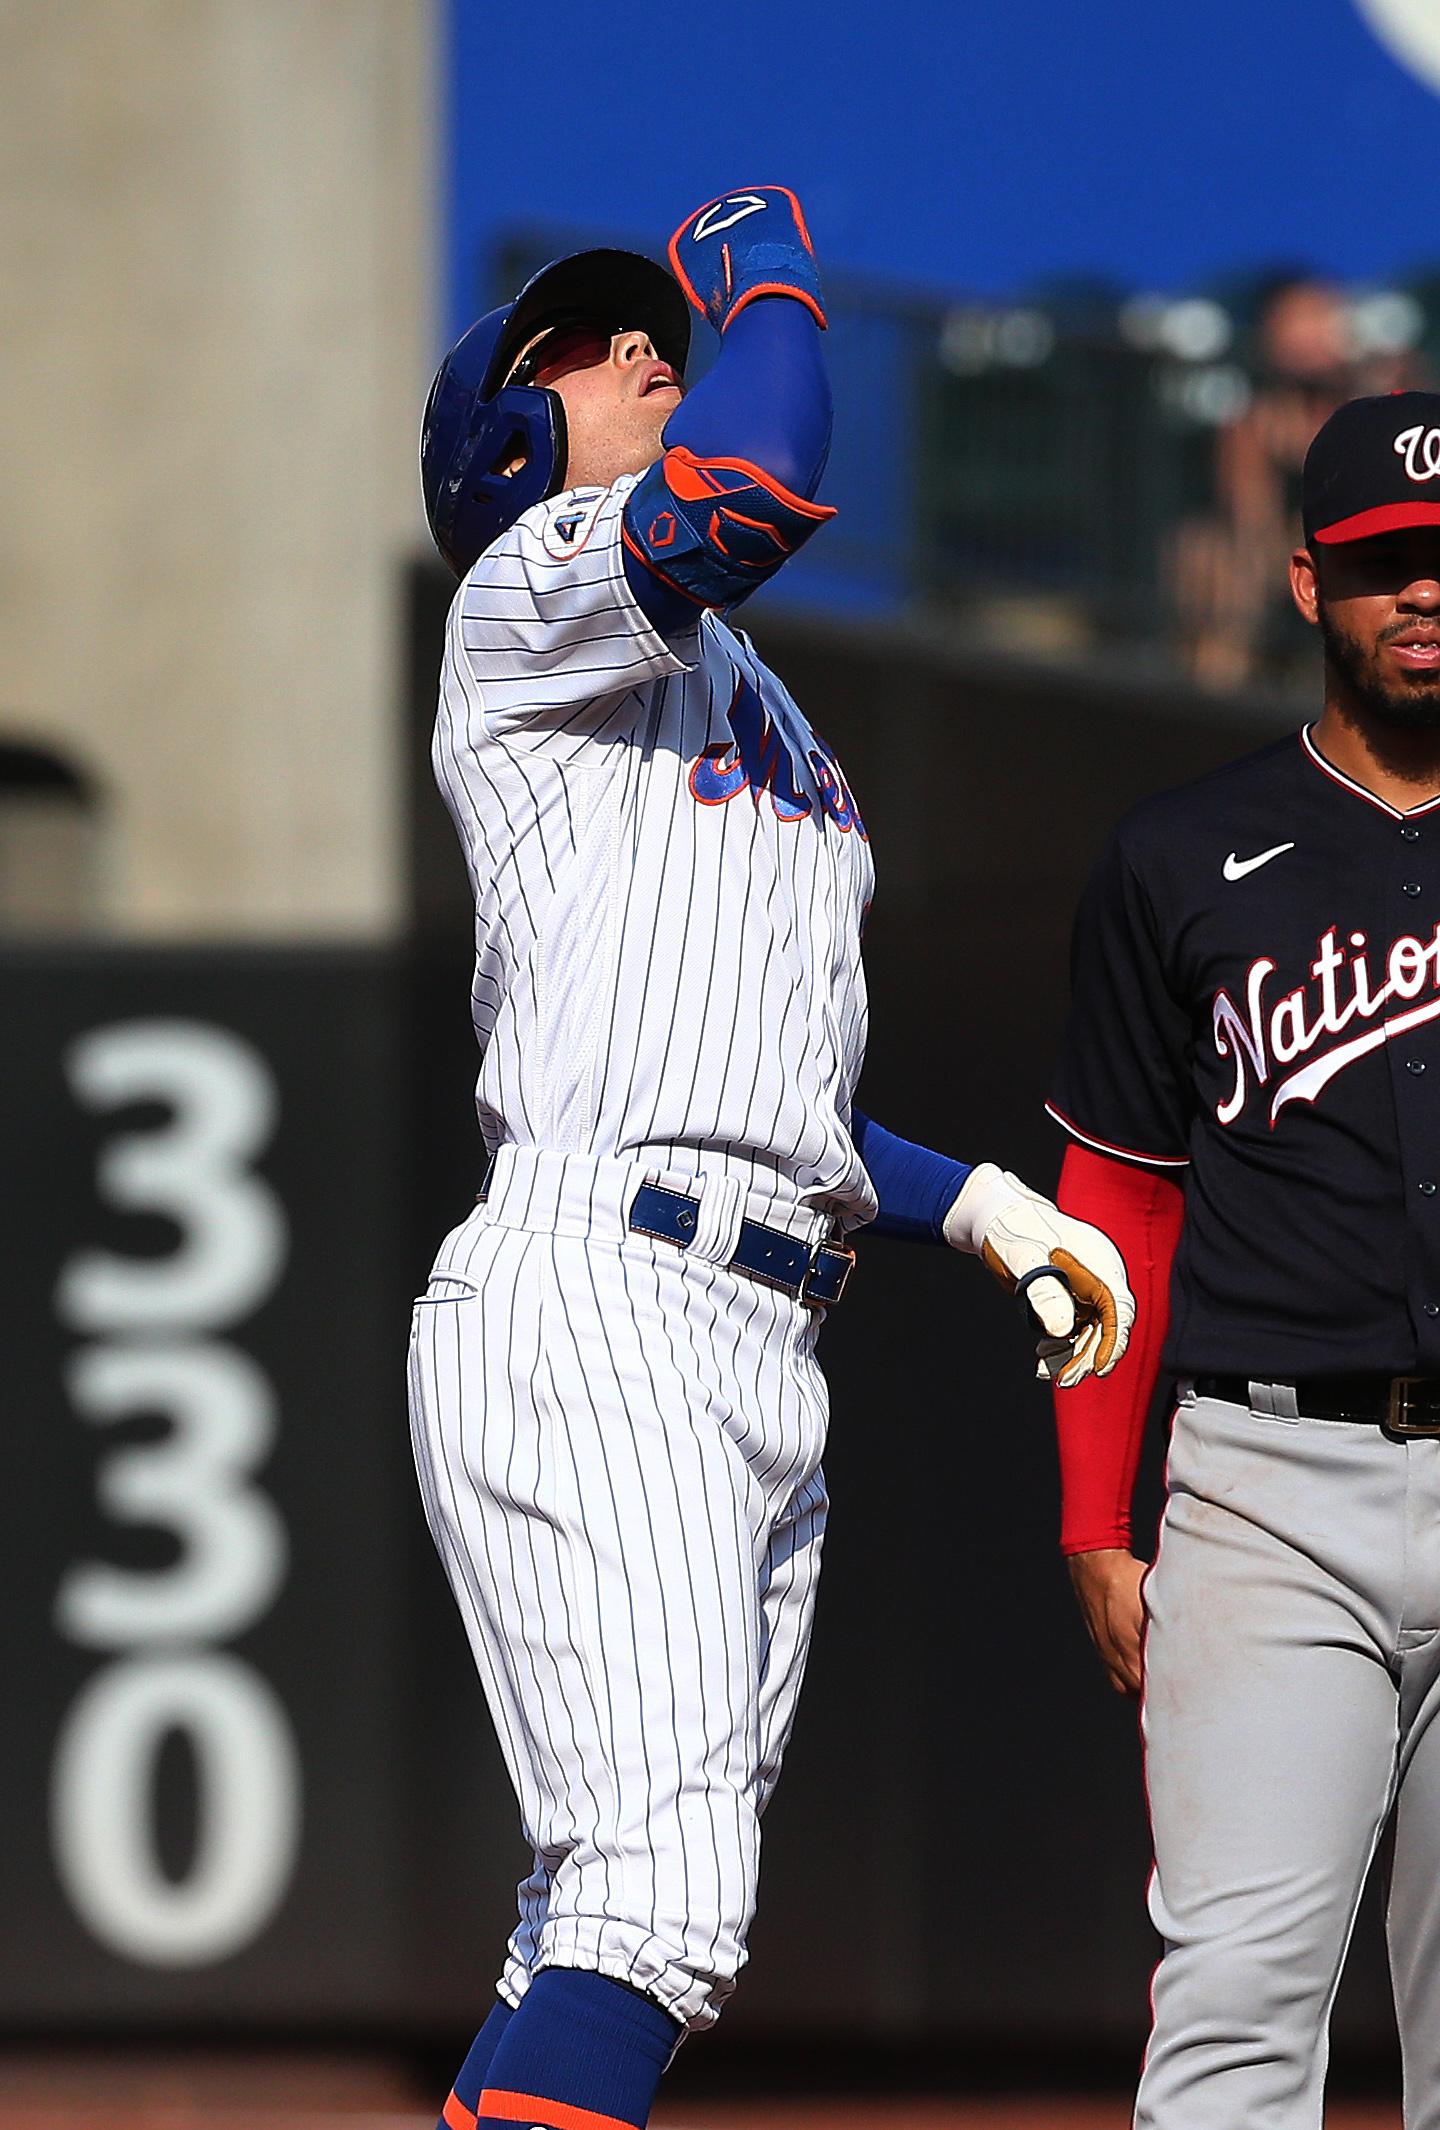 MLB: Game One-Washington Nationals at New York Mets